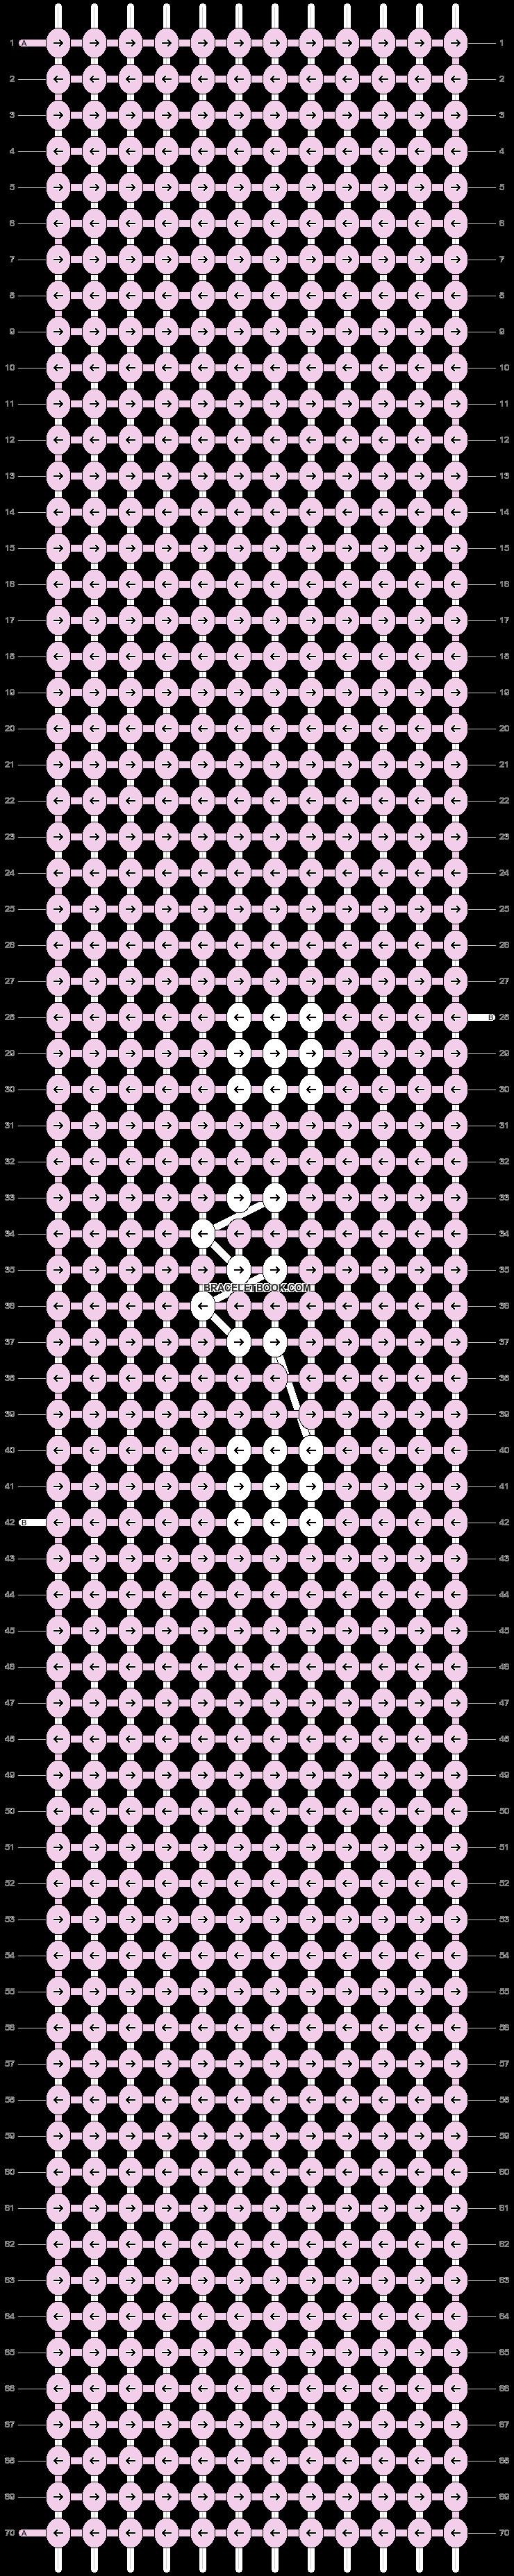 Alpha pattern #45878 variation #68740 pattern